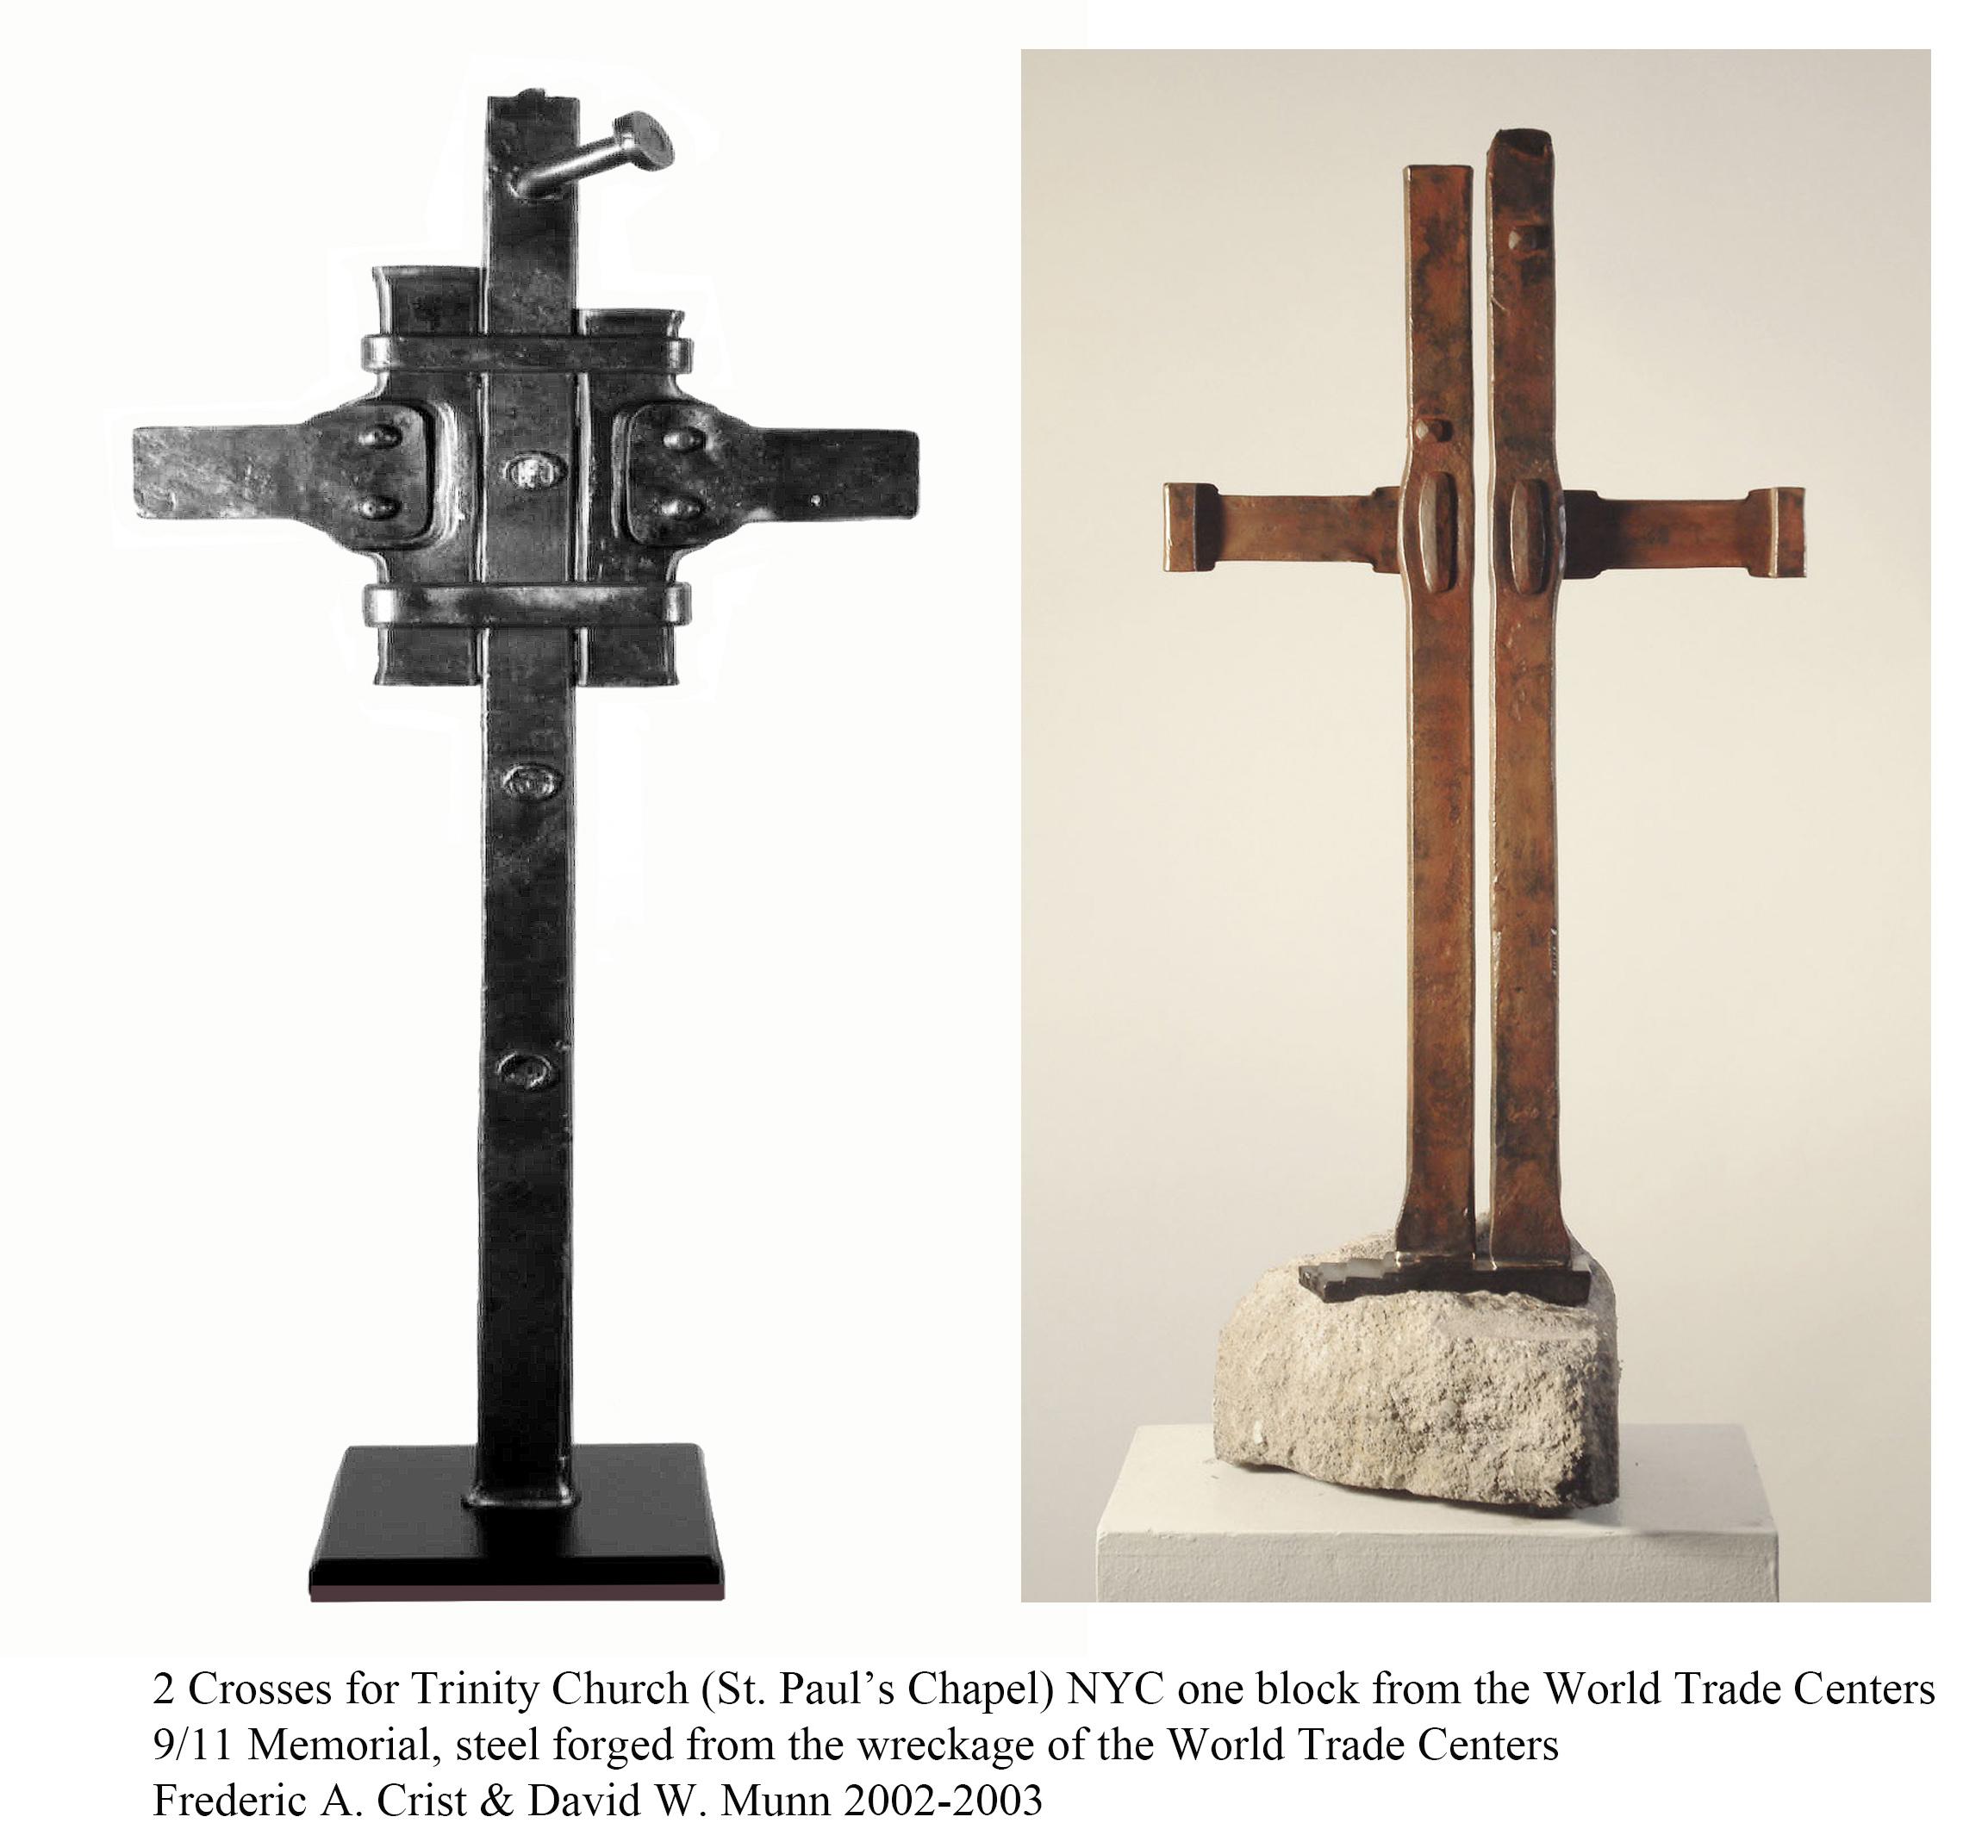 2 crosses for Trinity Church copy.jpg